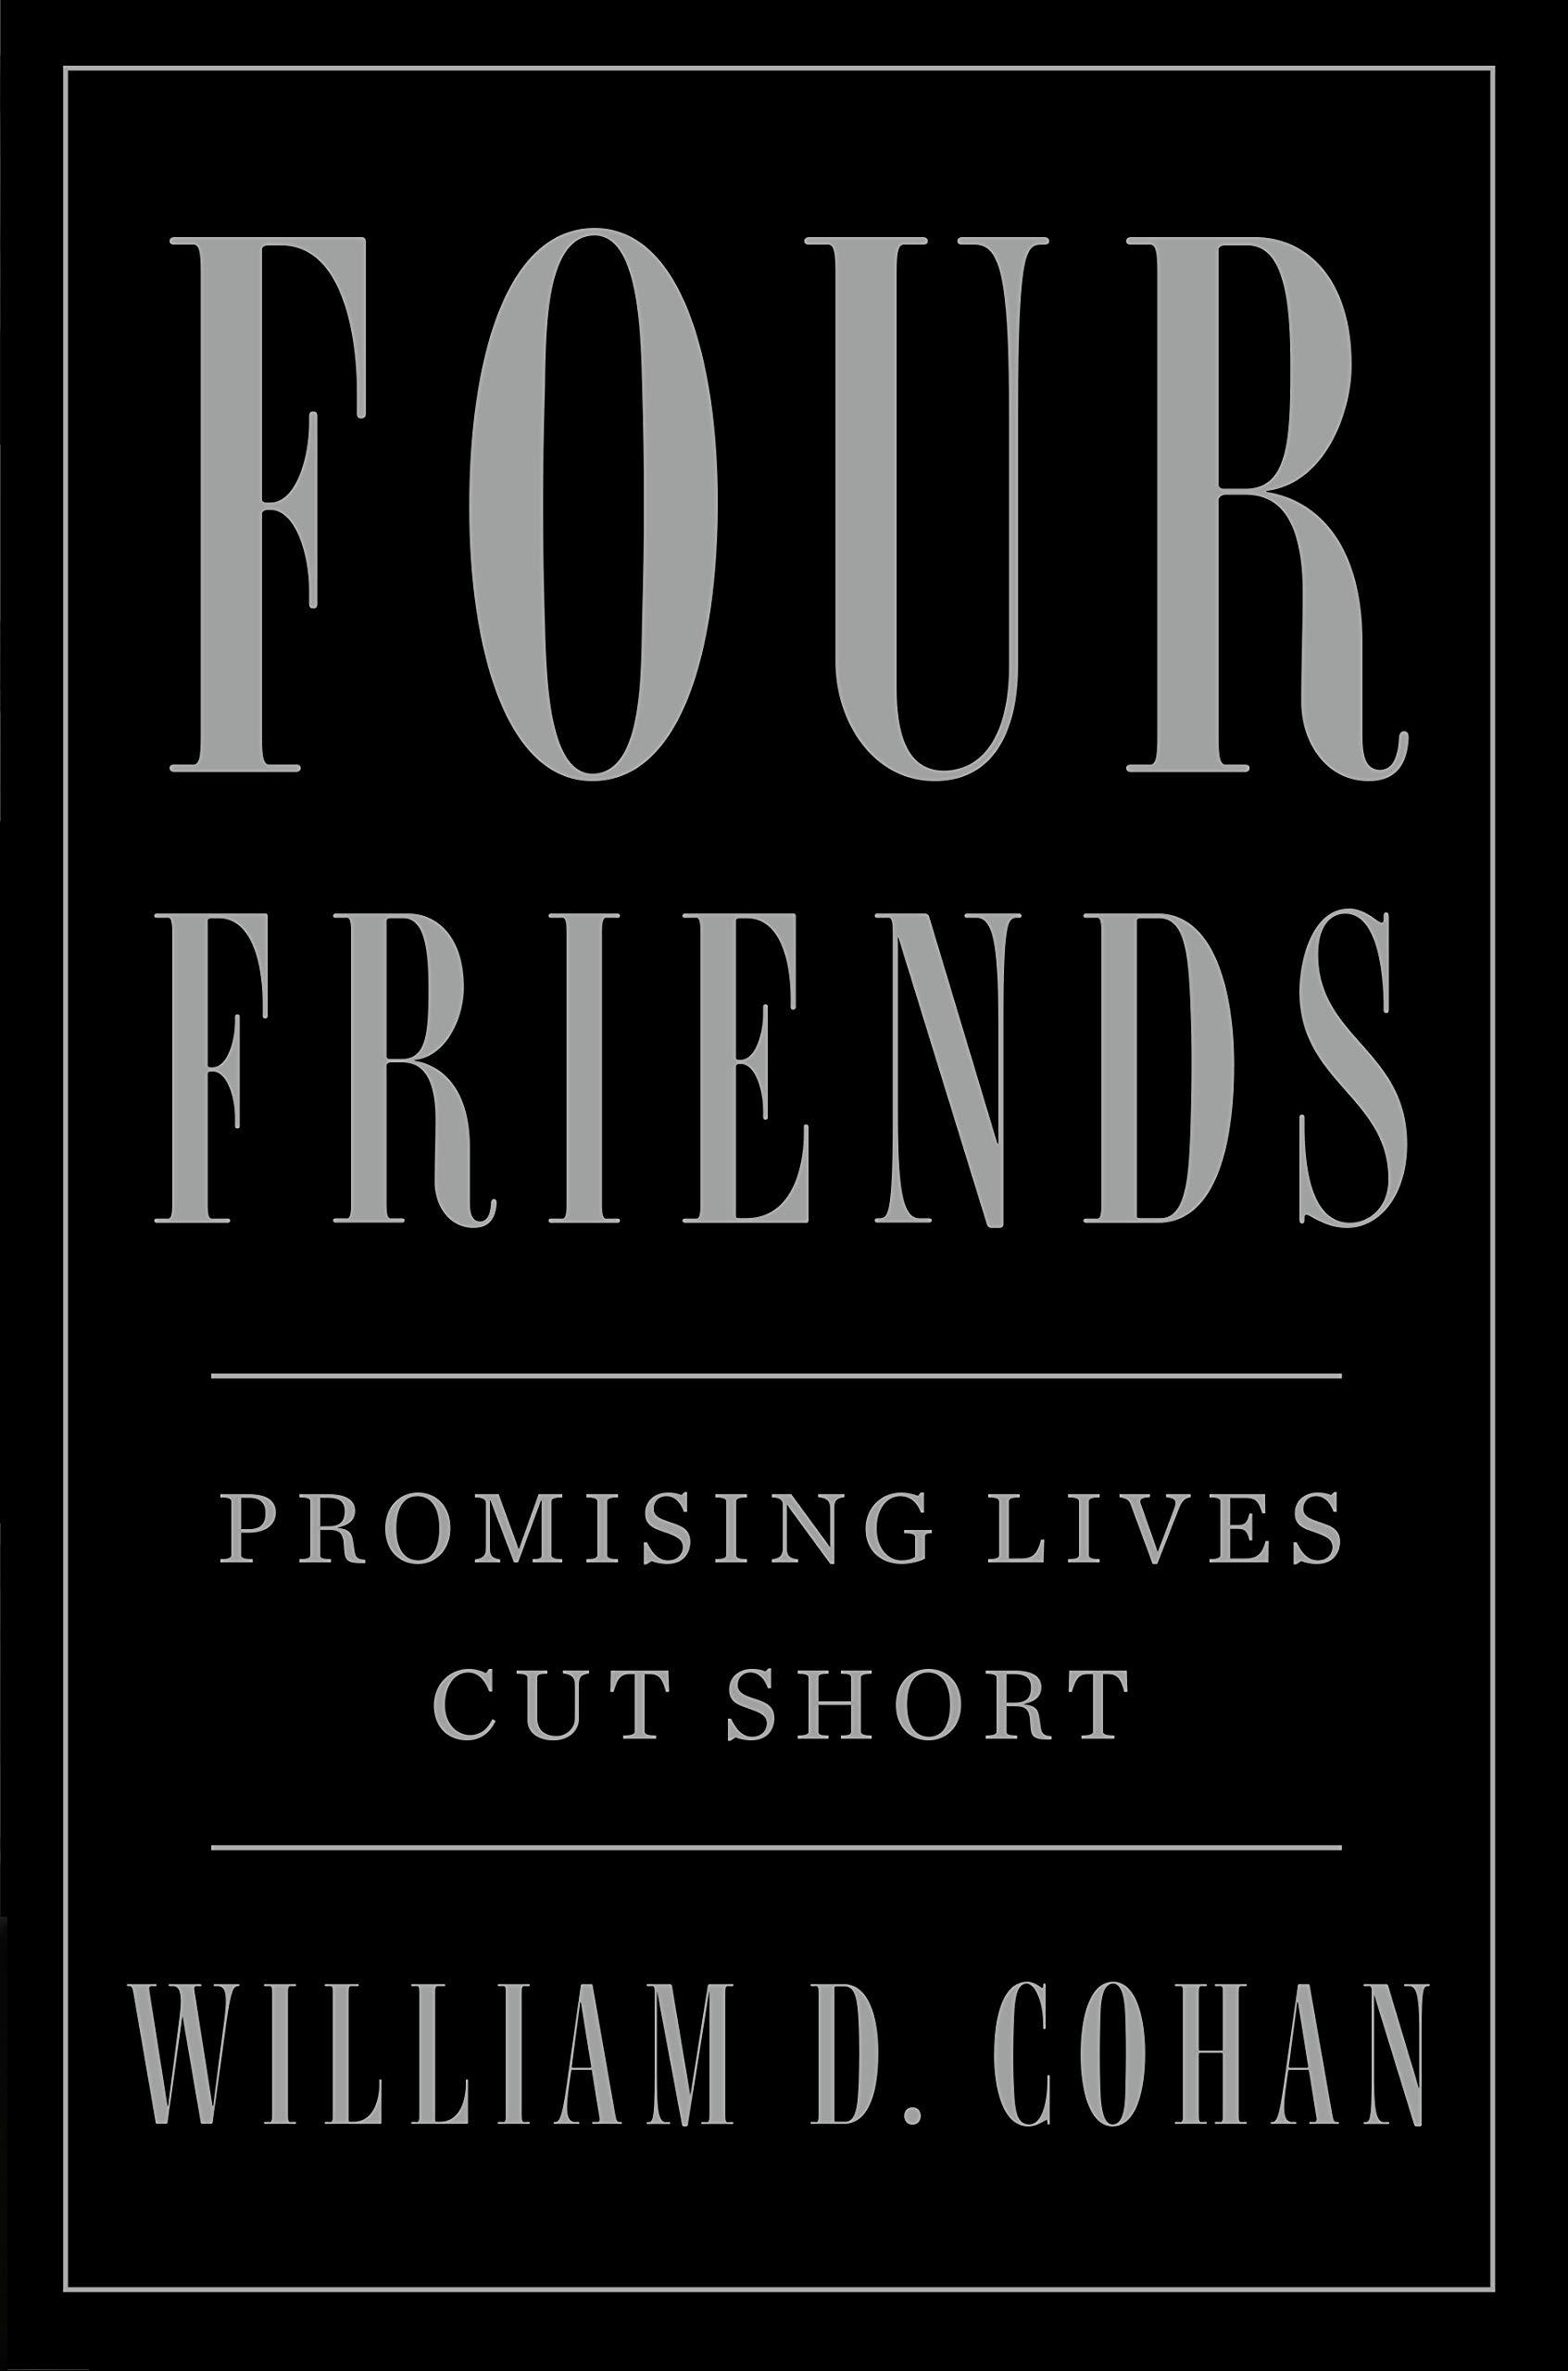 Four Friends Book Cover.jpg